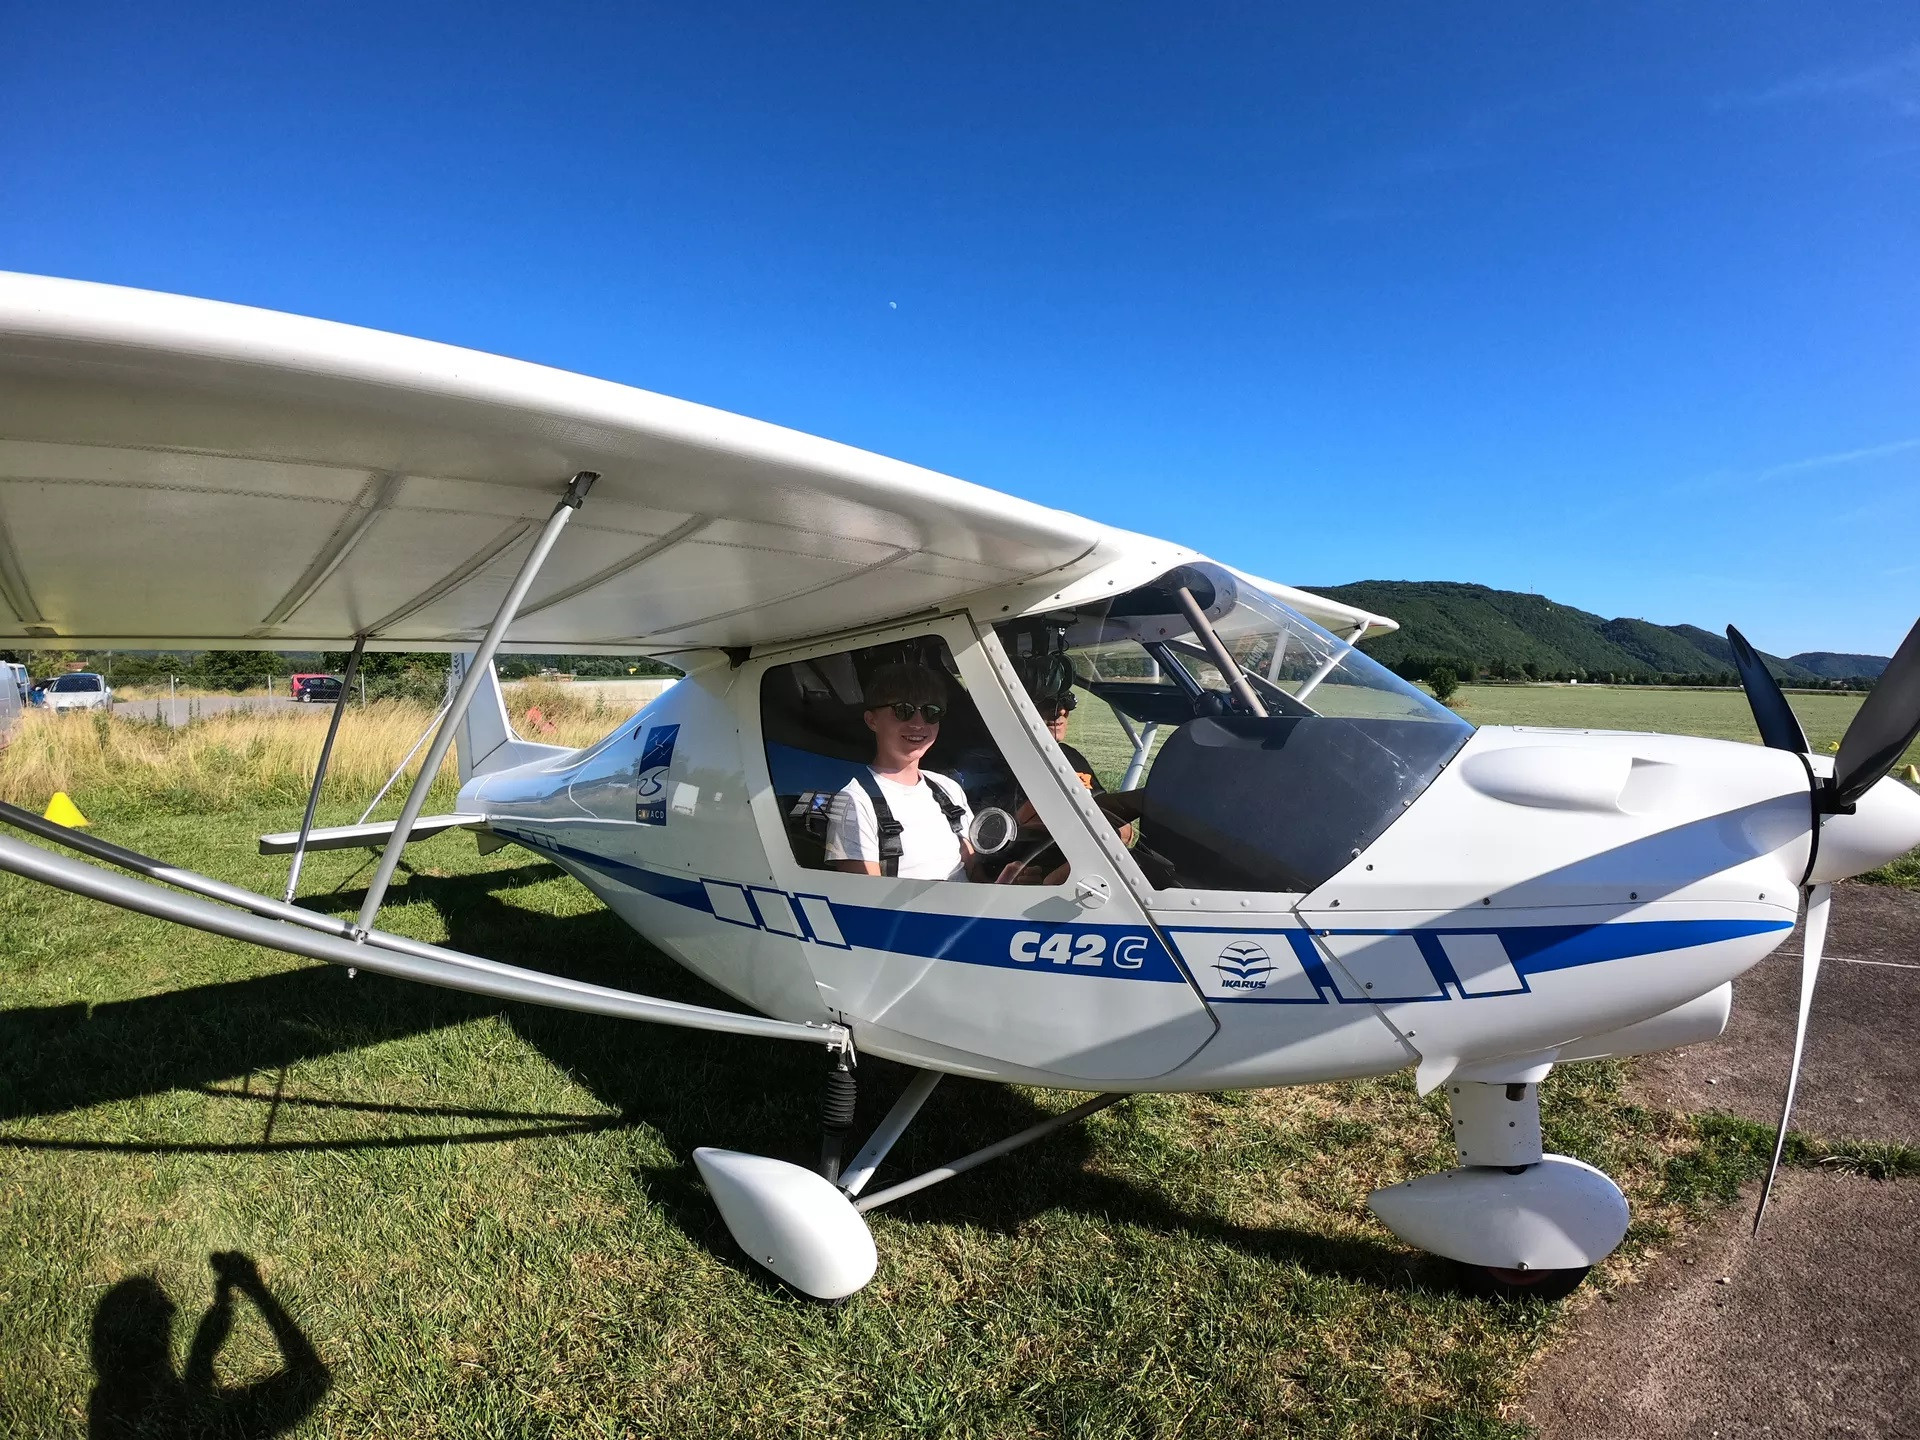 Réserver un vol en Multiaxe